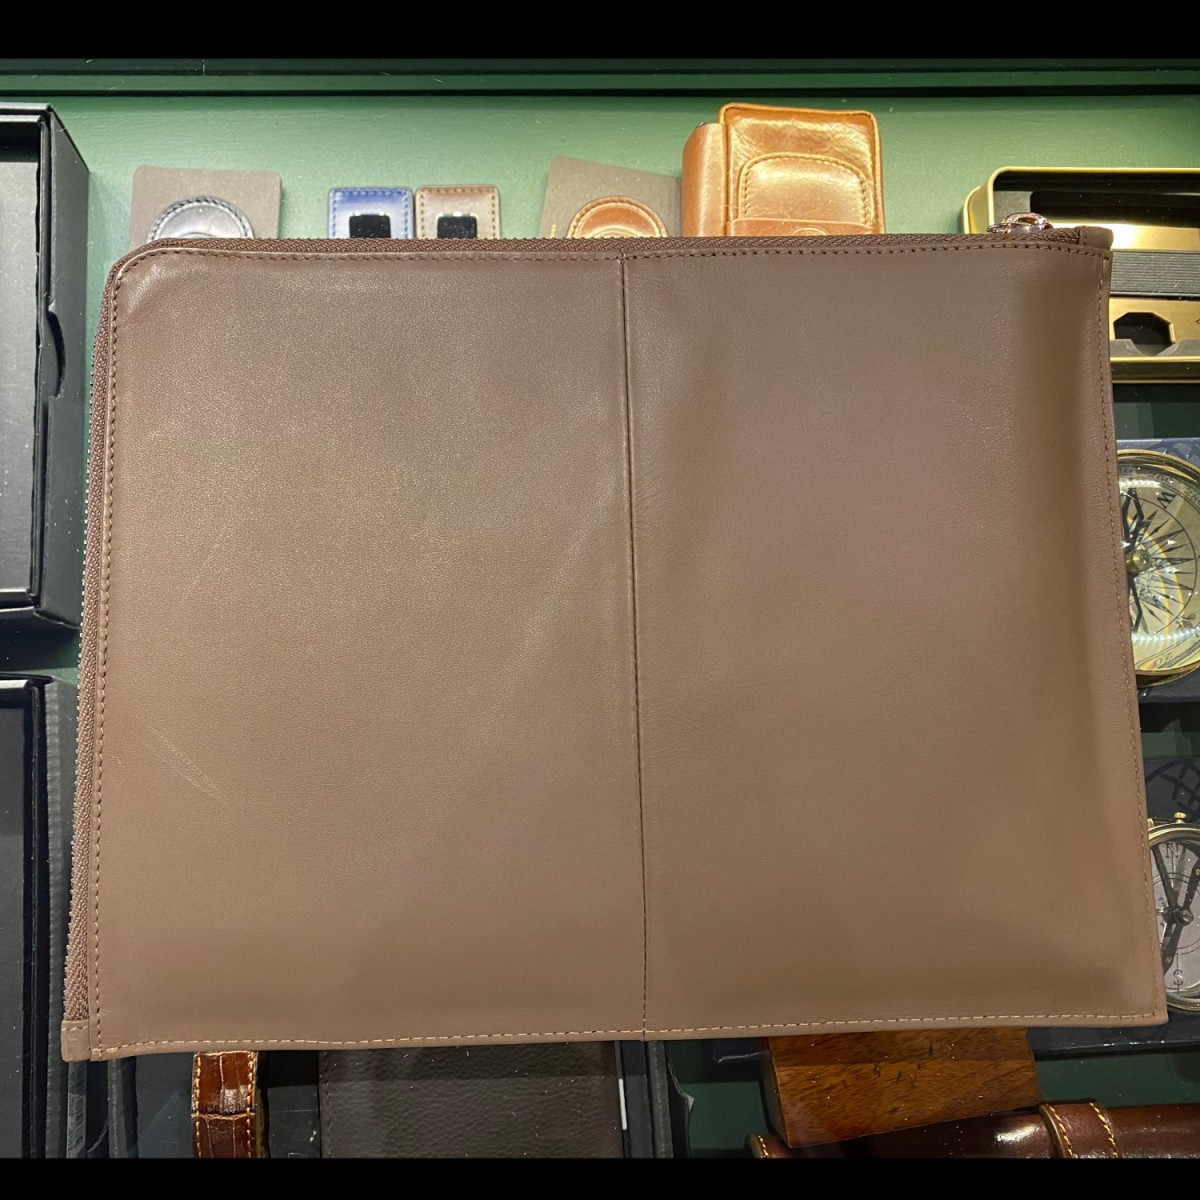 HUGO BOSS Verse custodia iPad, porta documenti A5, ricettario